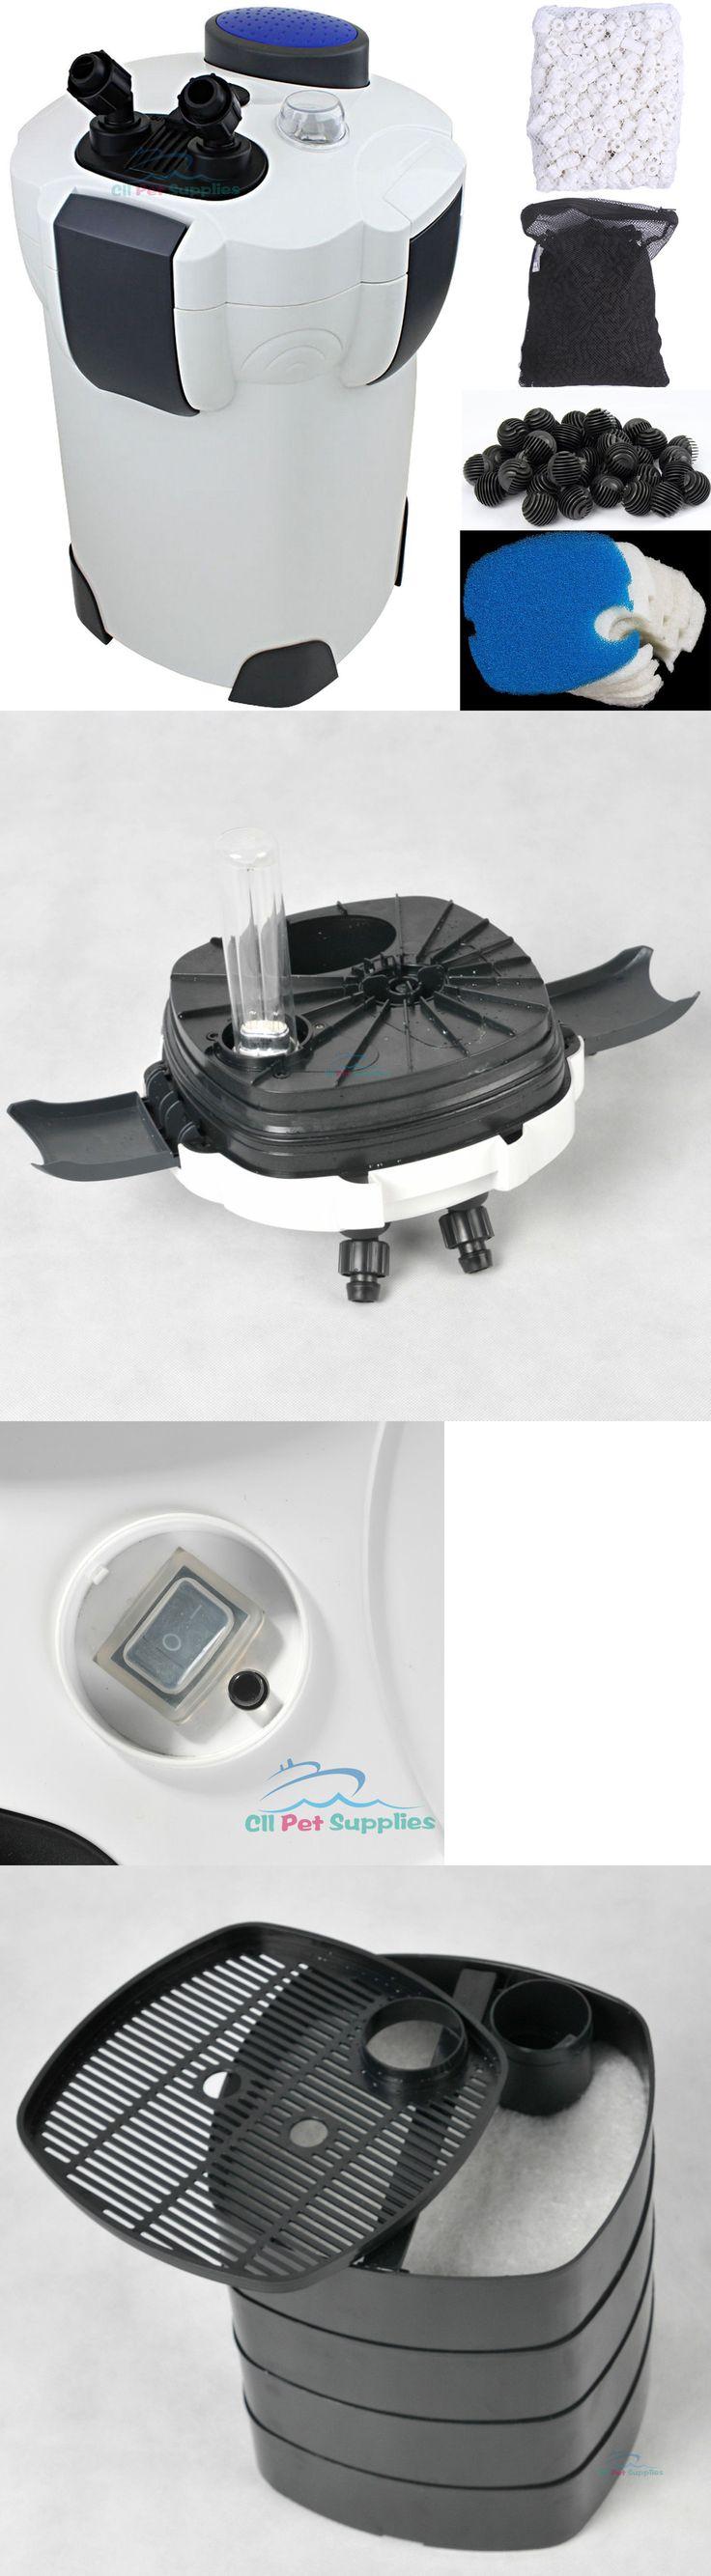 Filters 46310: Aquarium Canister Filter 9W Uv Sterilizer 525 Gph Fresh/Salt 175Gal Free Media -> BUY IT NOW ONLY: $61.45 on eBay!